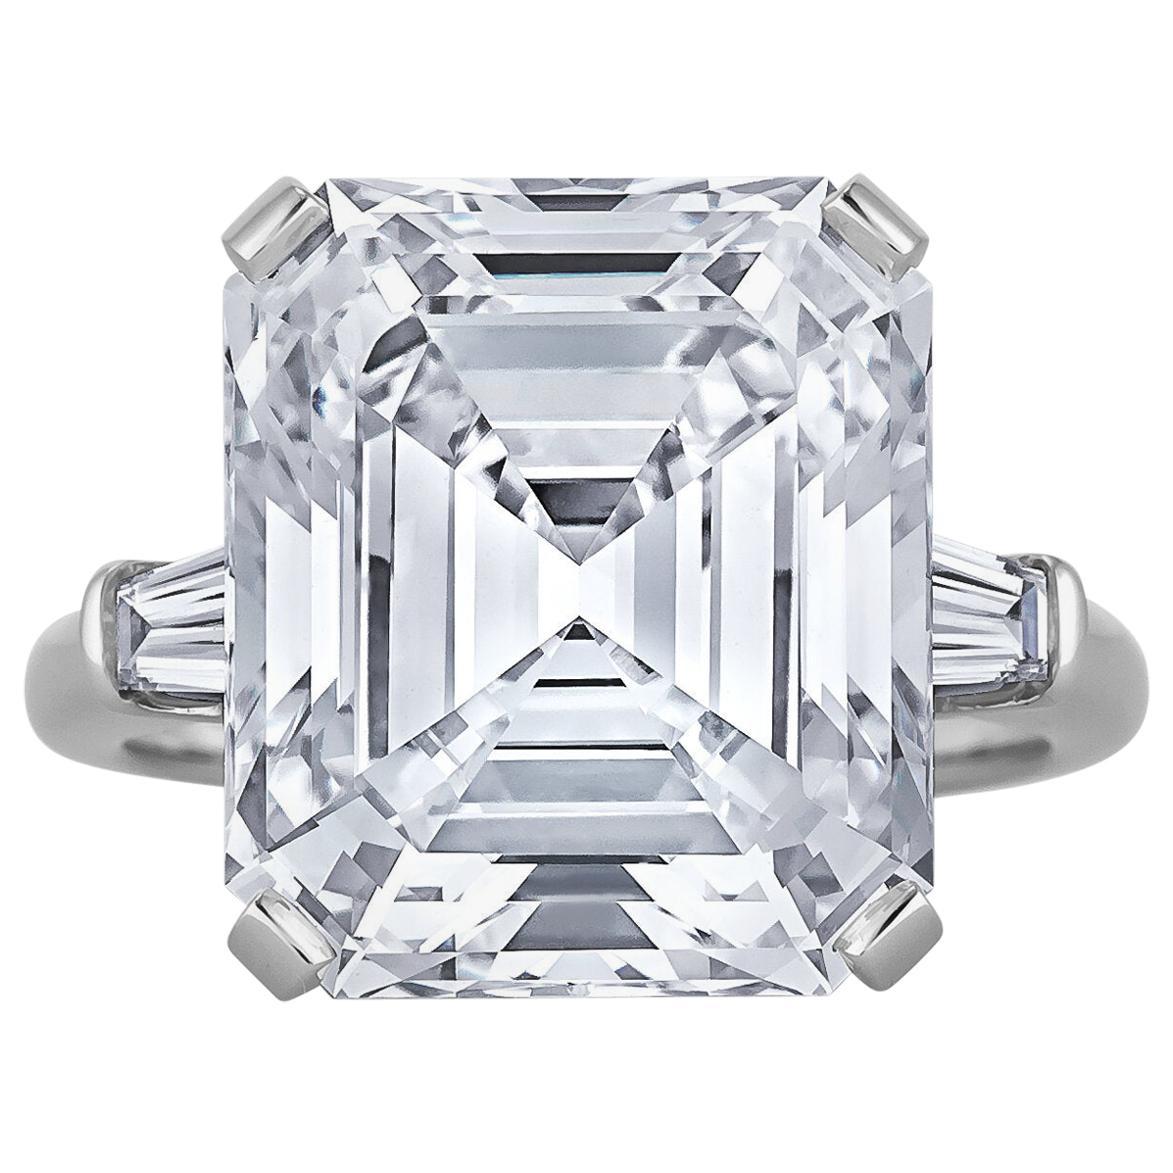 11.64 Carat Emerald Cut Diamond Engagement Ring